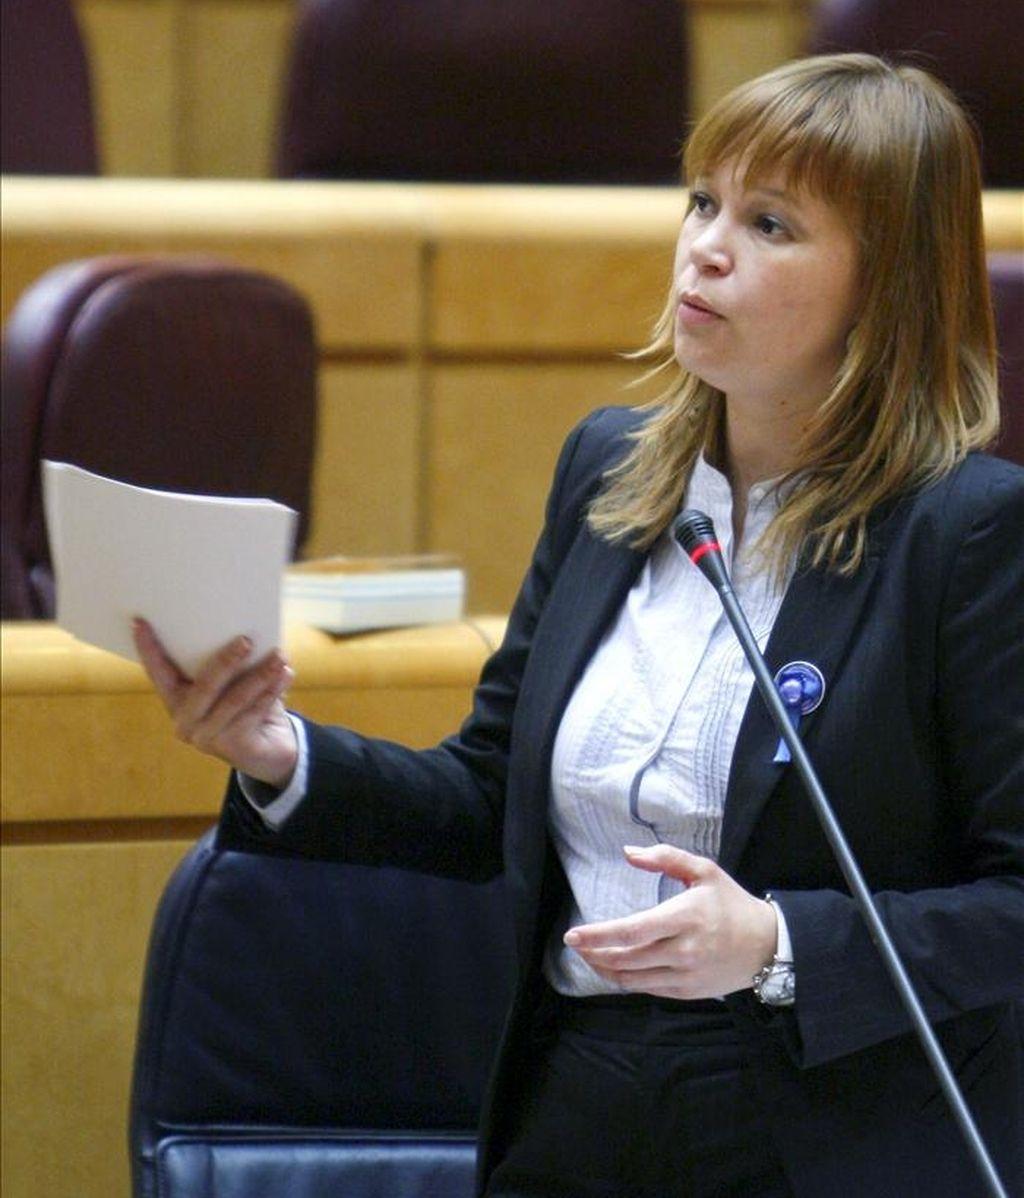 La ministra de Sanidad, Leire Pajín. EFE/Archivo